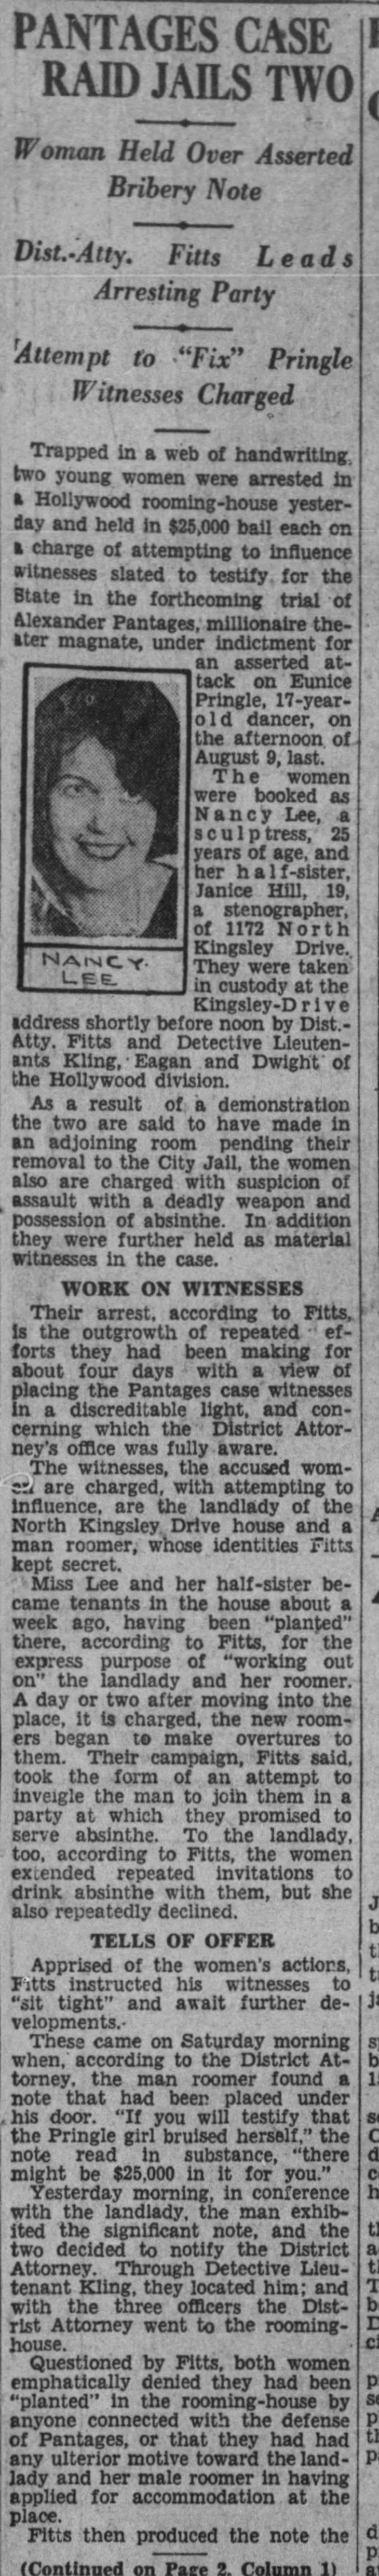 Nancy Lee Janice Hill arrest The_Los_Angeles_Times_Mon__Sep_9__1929_